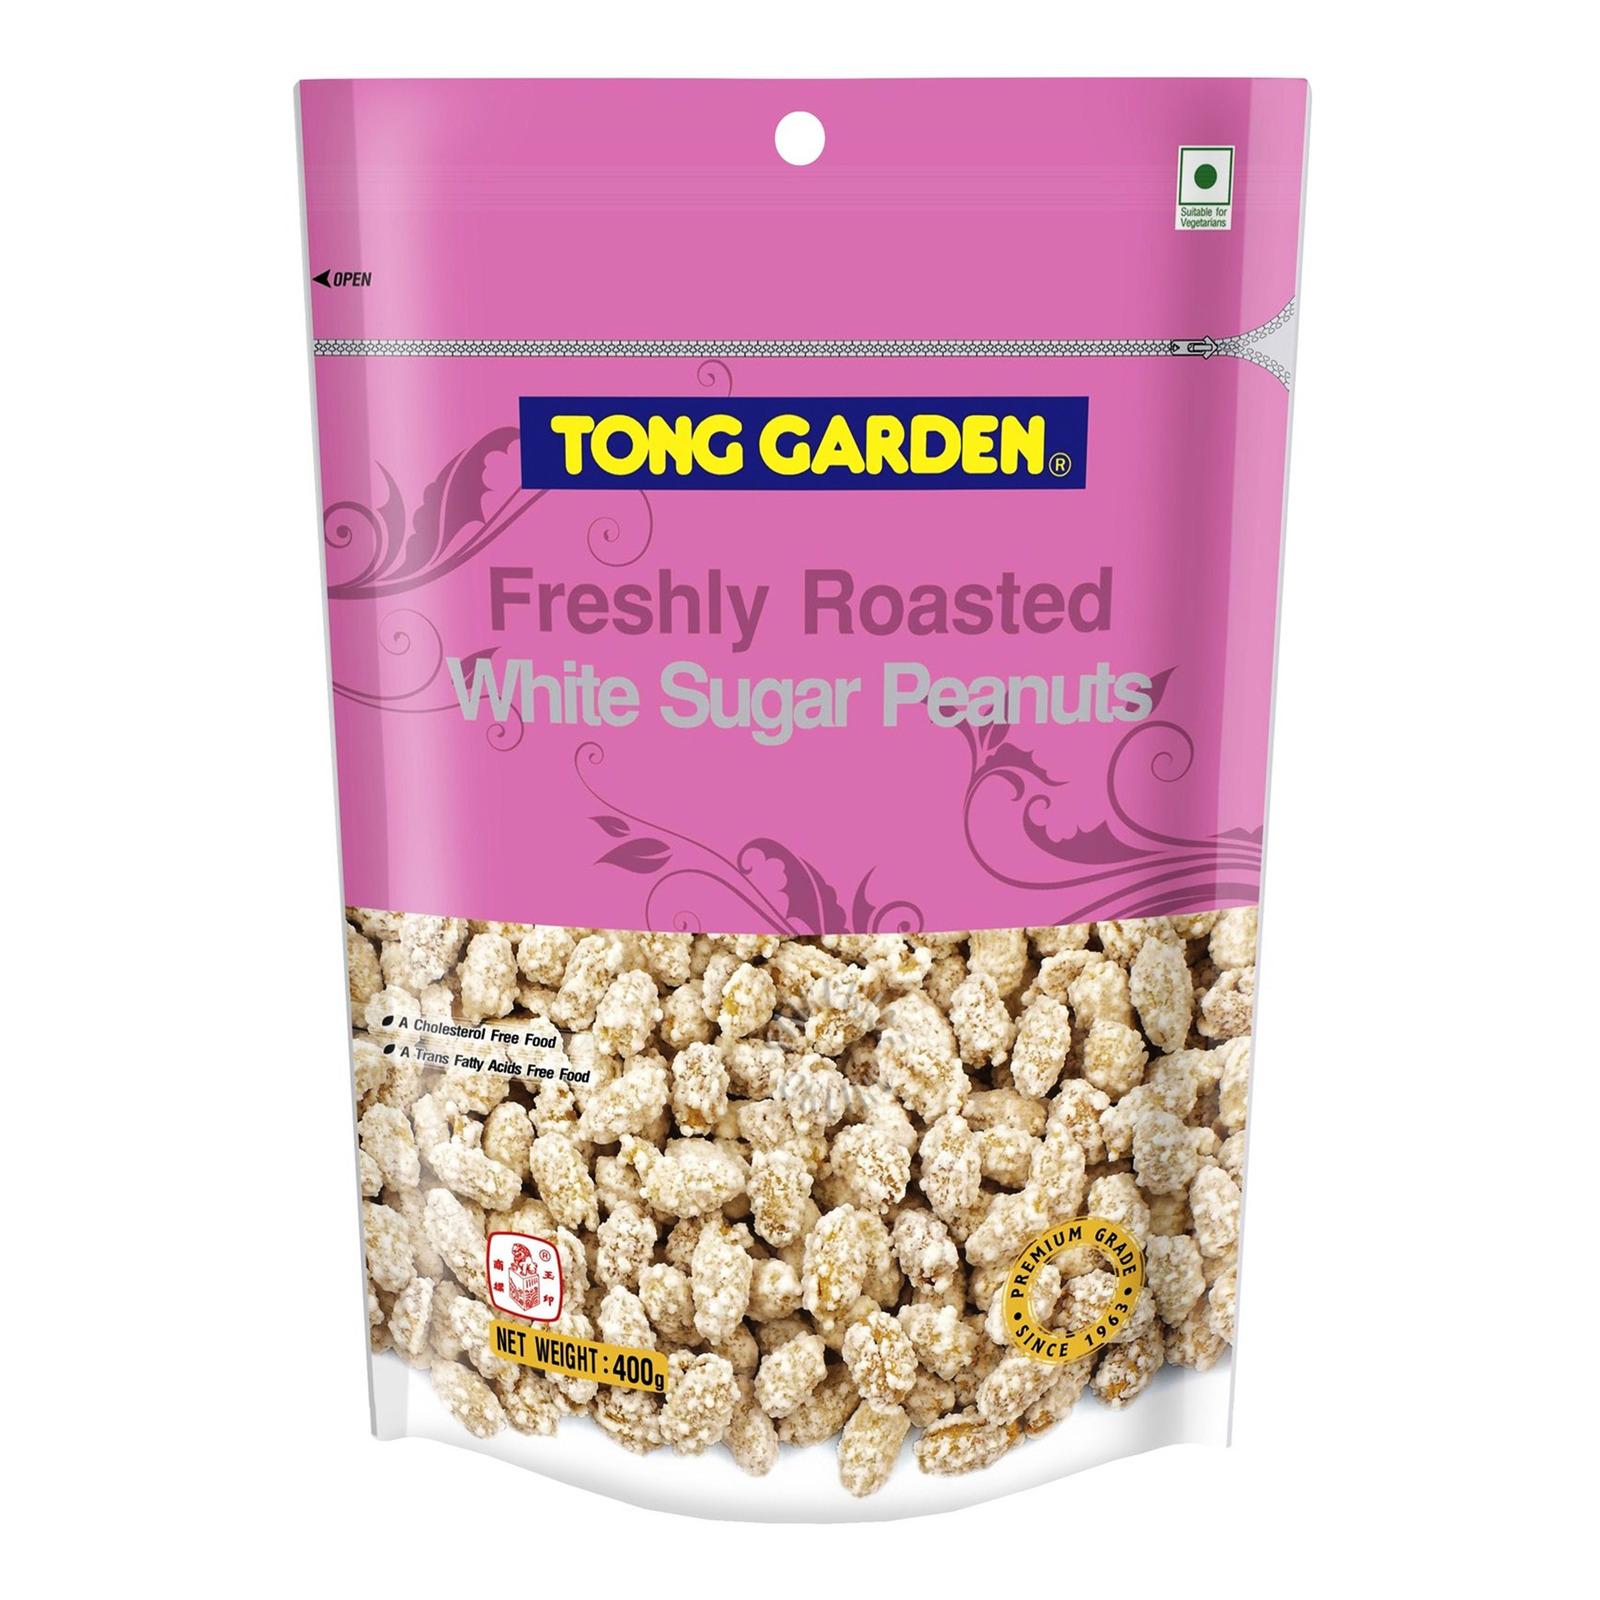 Tong Garden Freshly Roasted White Sugar Peanuts